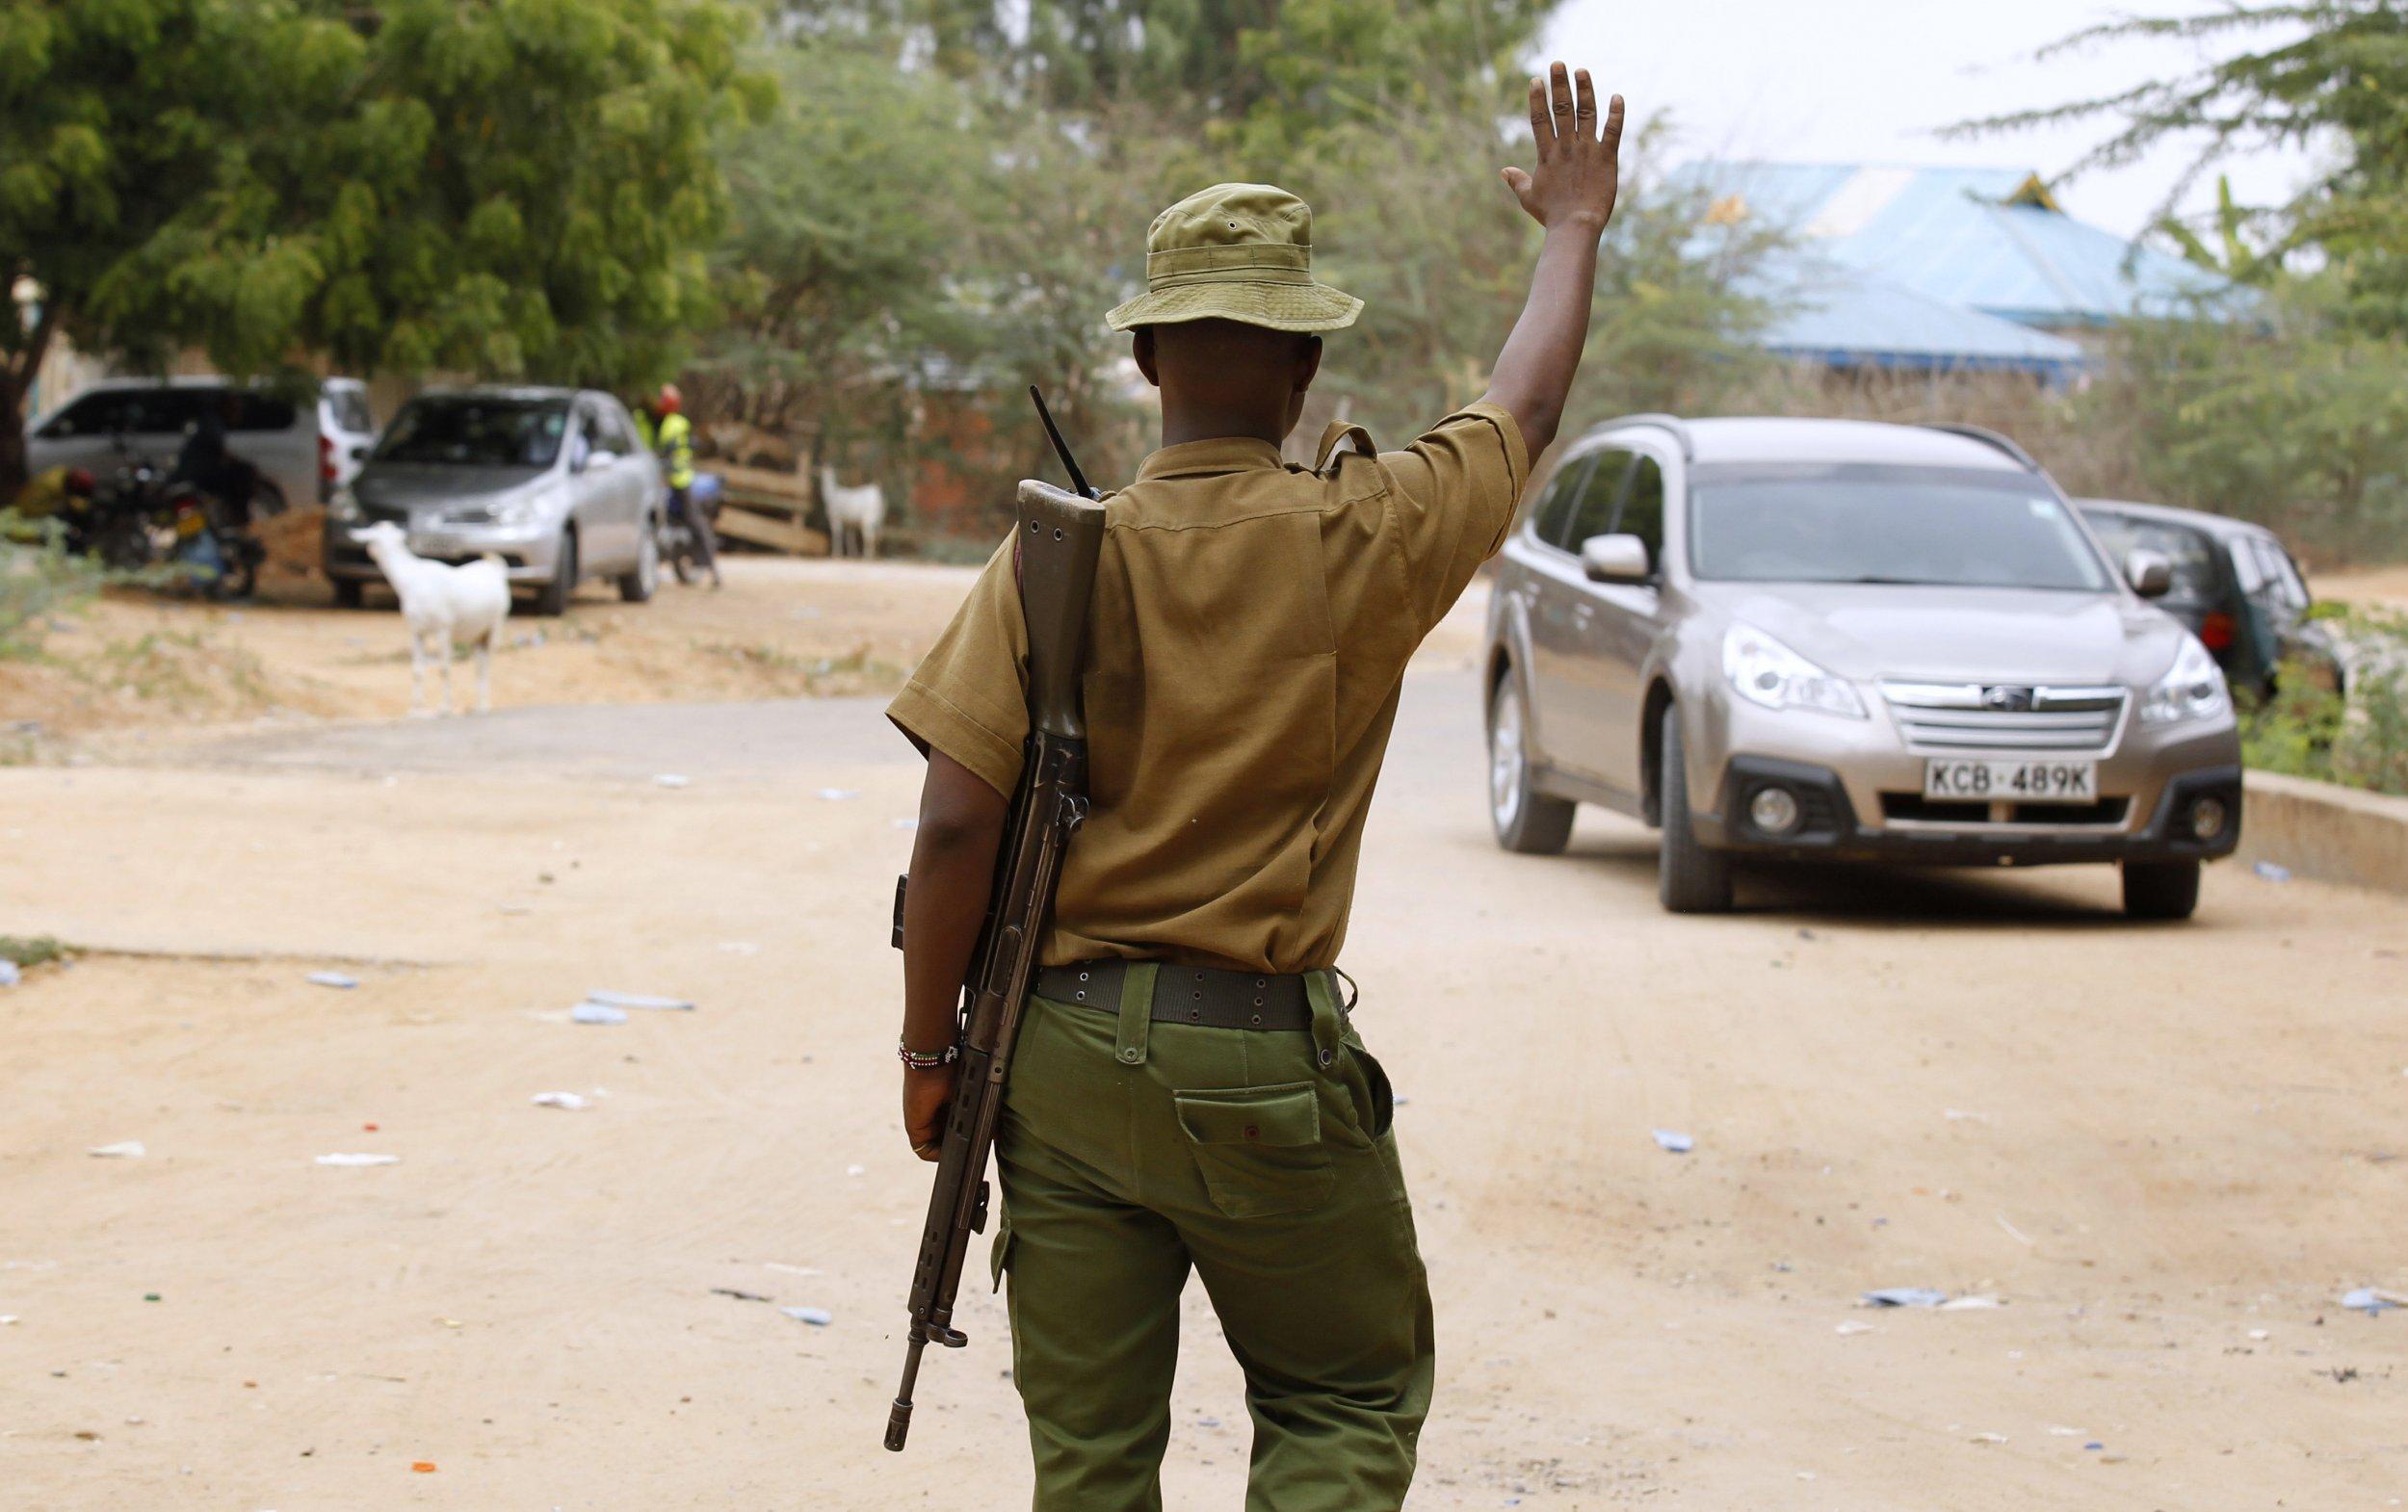 A Kenyan police officer stops a car outside Garissa University College.